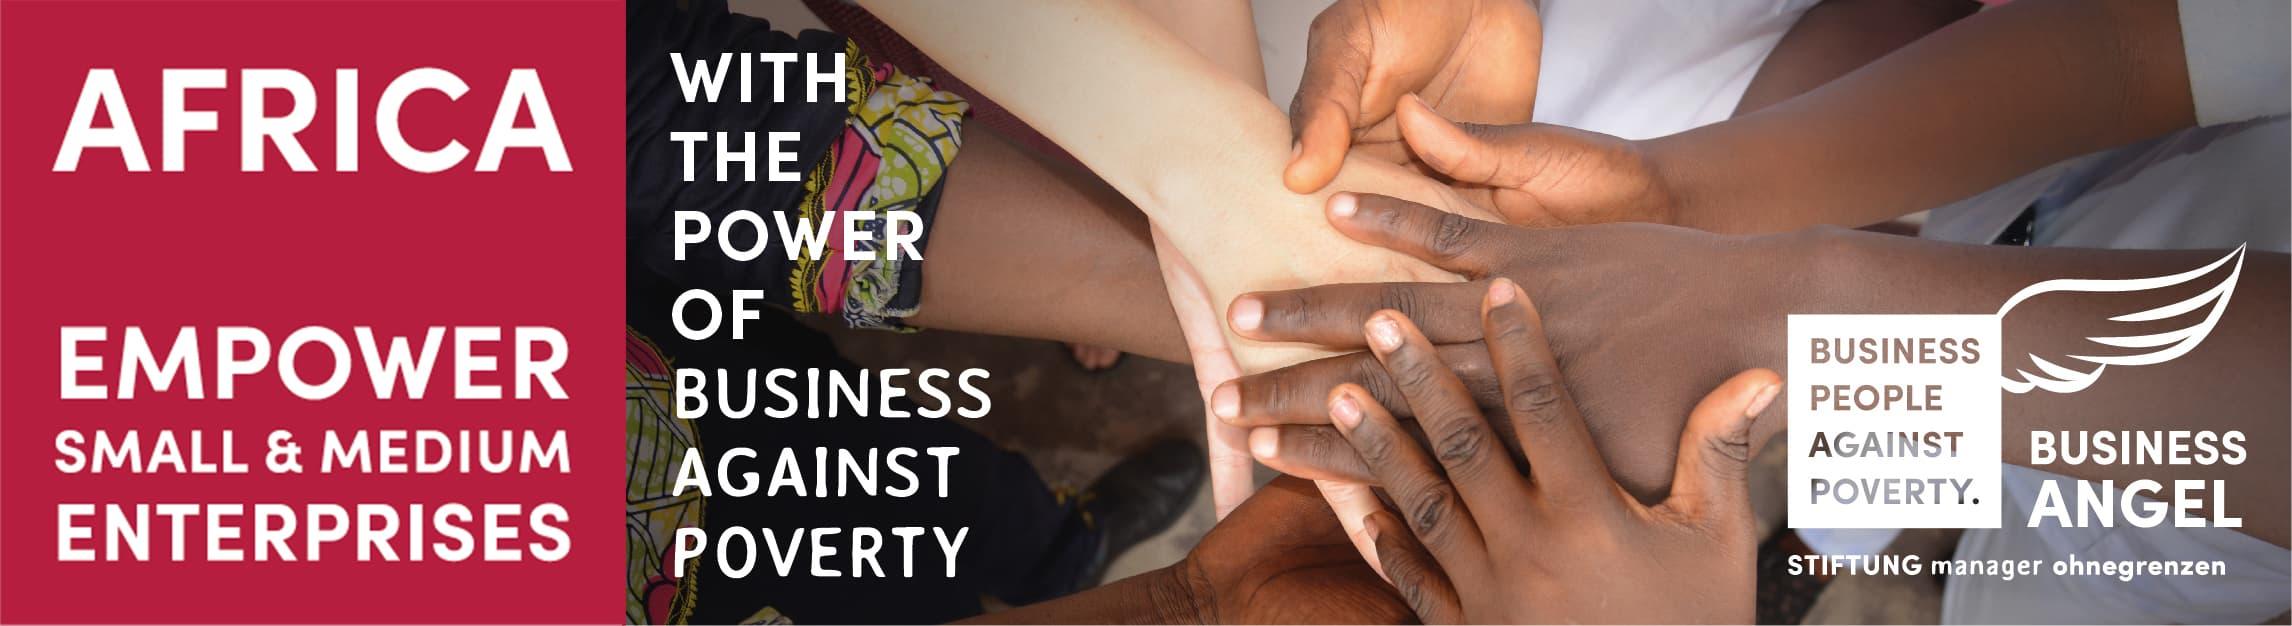 AFRICA - empower small & medium enterprises